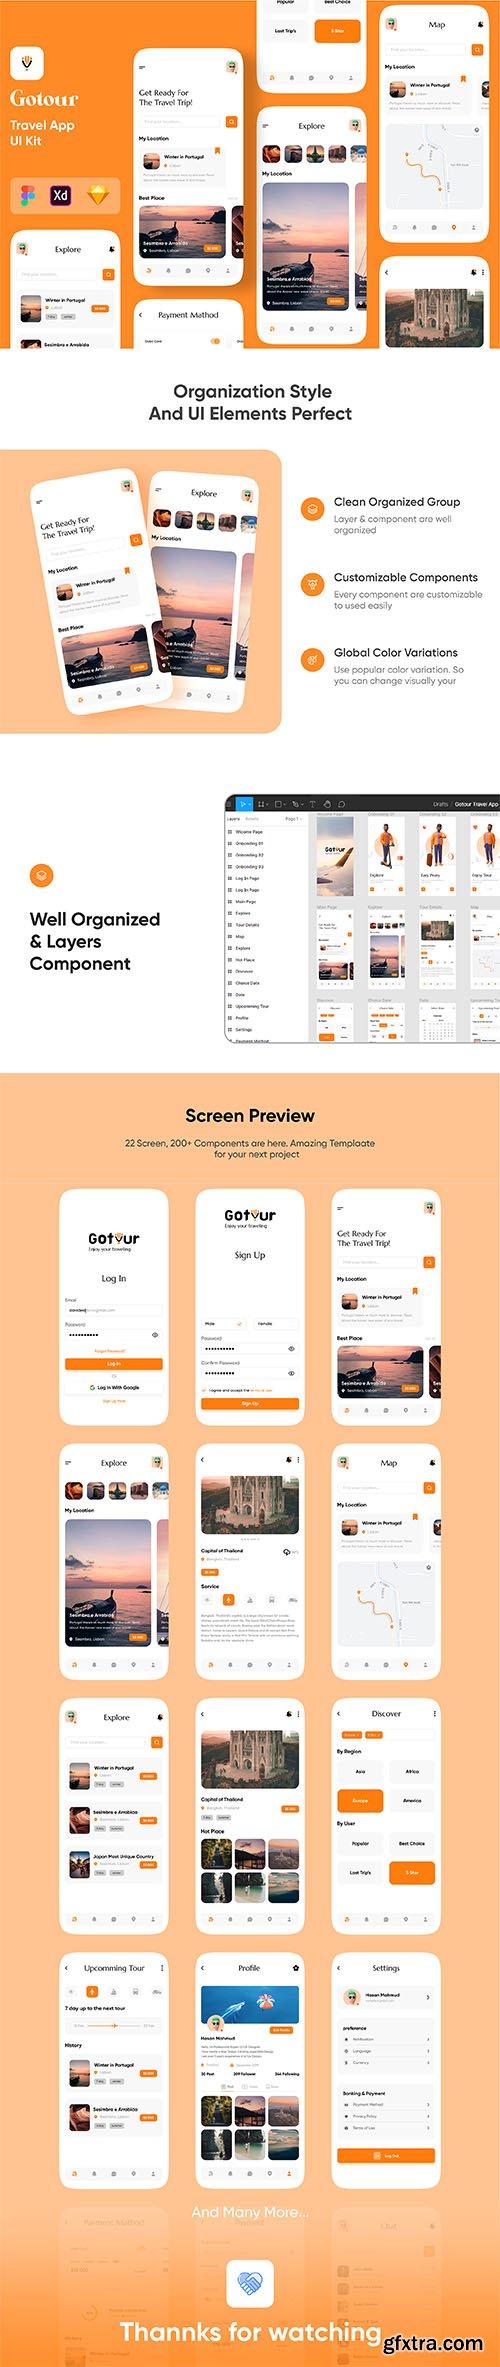 Gotour - Travel app design